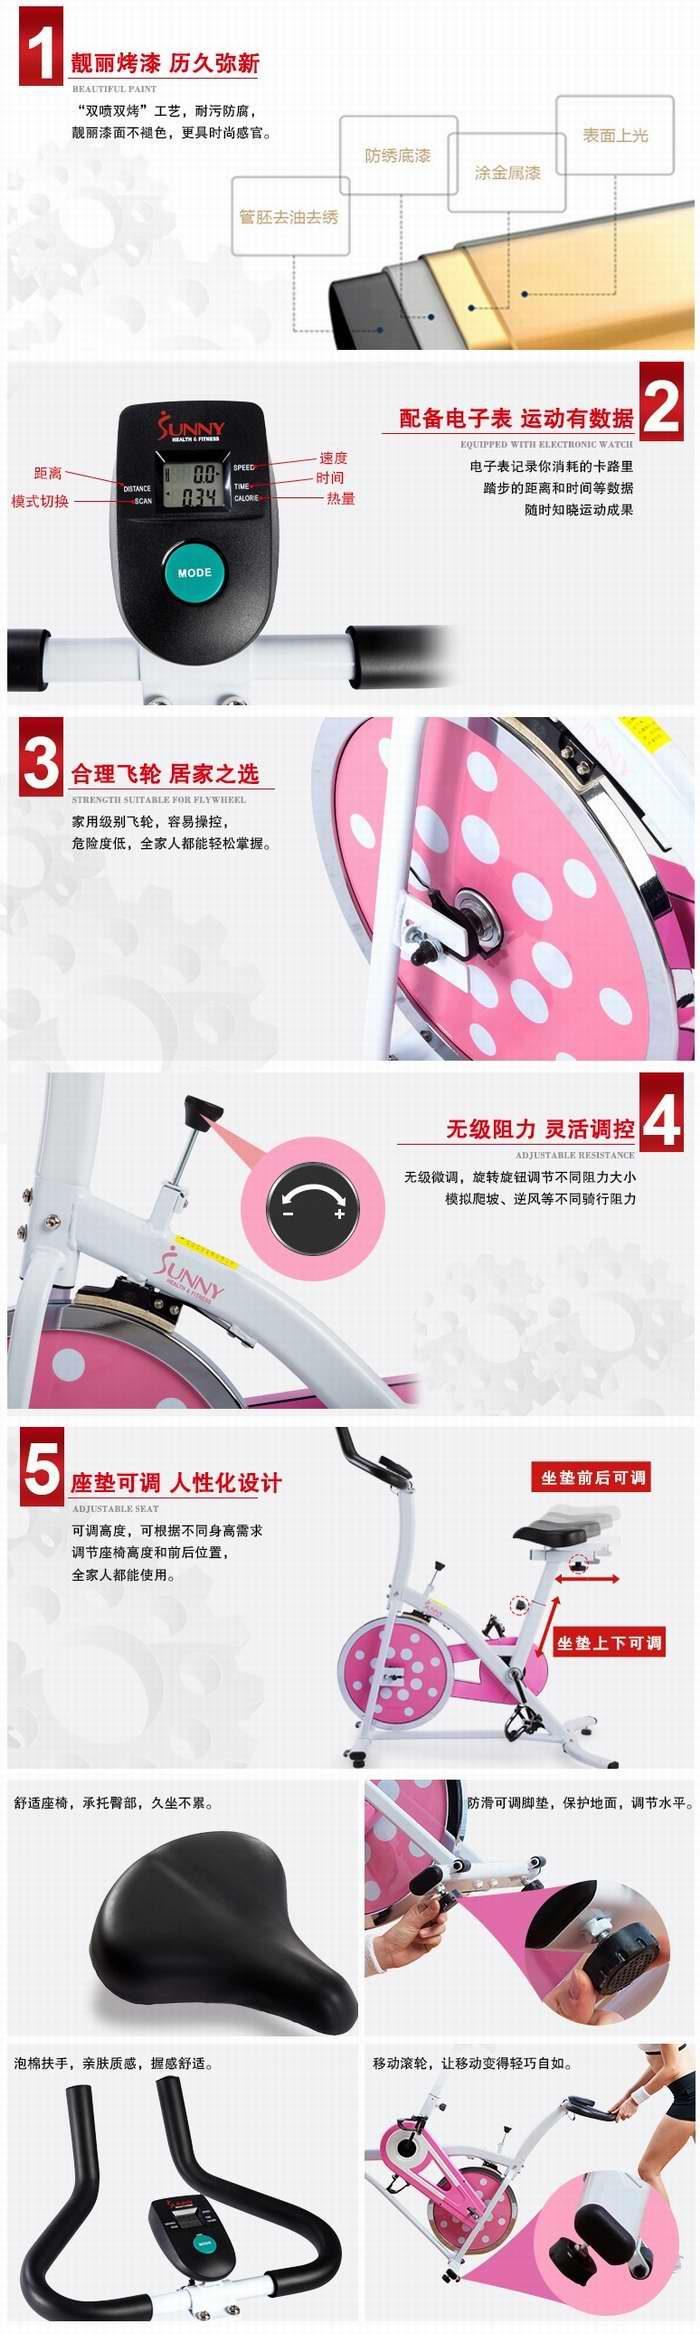 Sunny Health and Fitness SF-B1203 炫彩动感 家用静音健身自行车 246.97加元包邮!